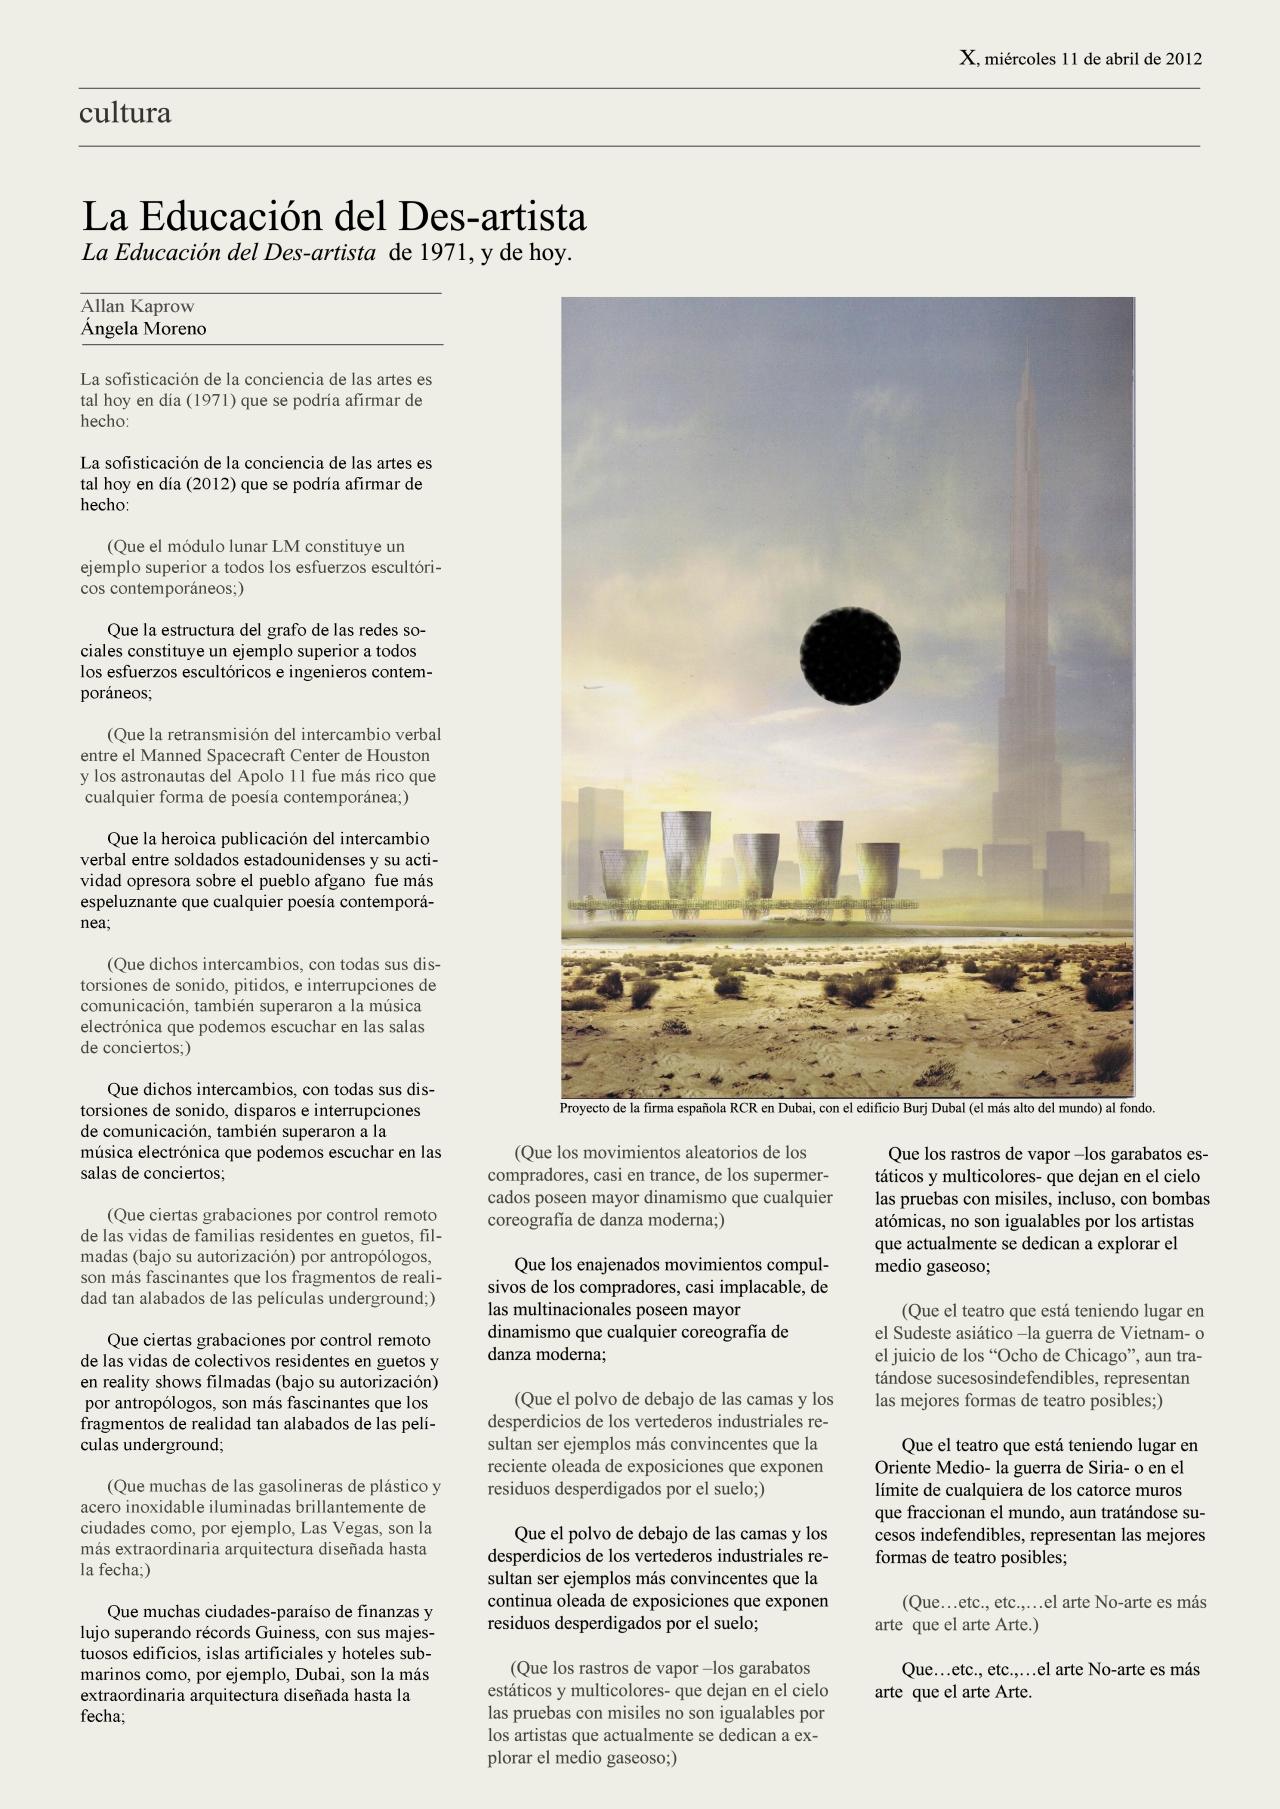 1st Text Allan Kaprow (1971) . 2nd Text Ángela Moreno (2012).